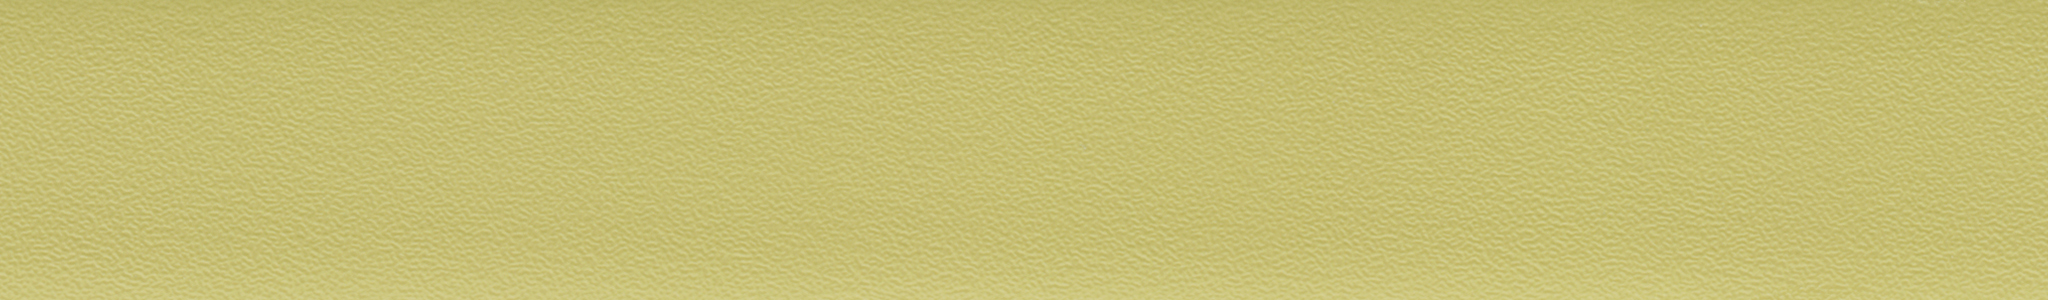 HU 167106 ABS hrana zelená perla 101